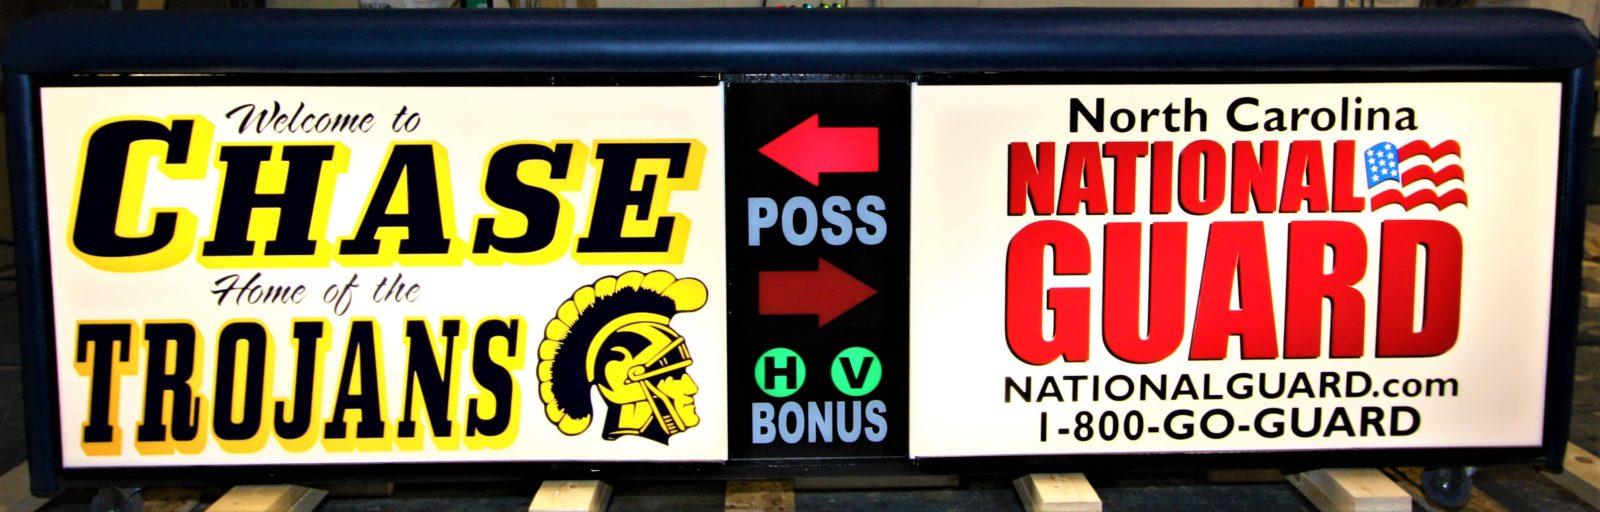 Chase High school scoring table North Carolina Army National Guard NCARNG